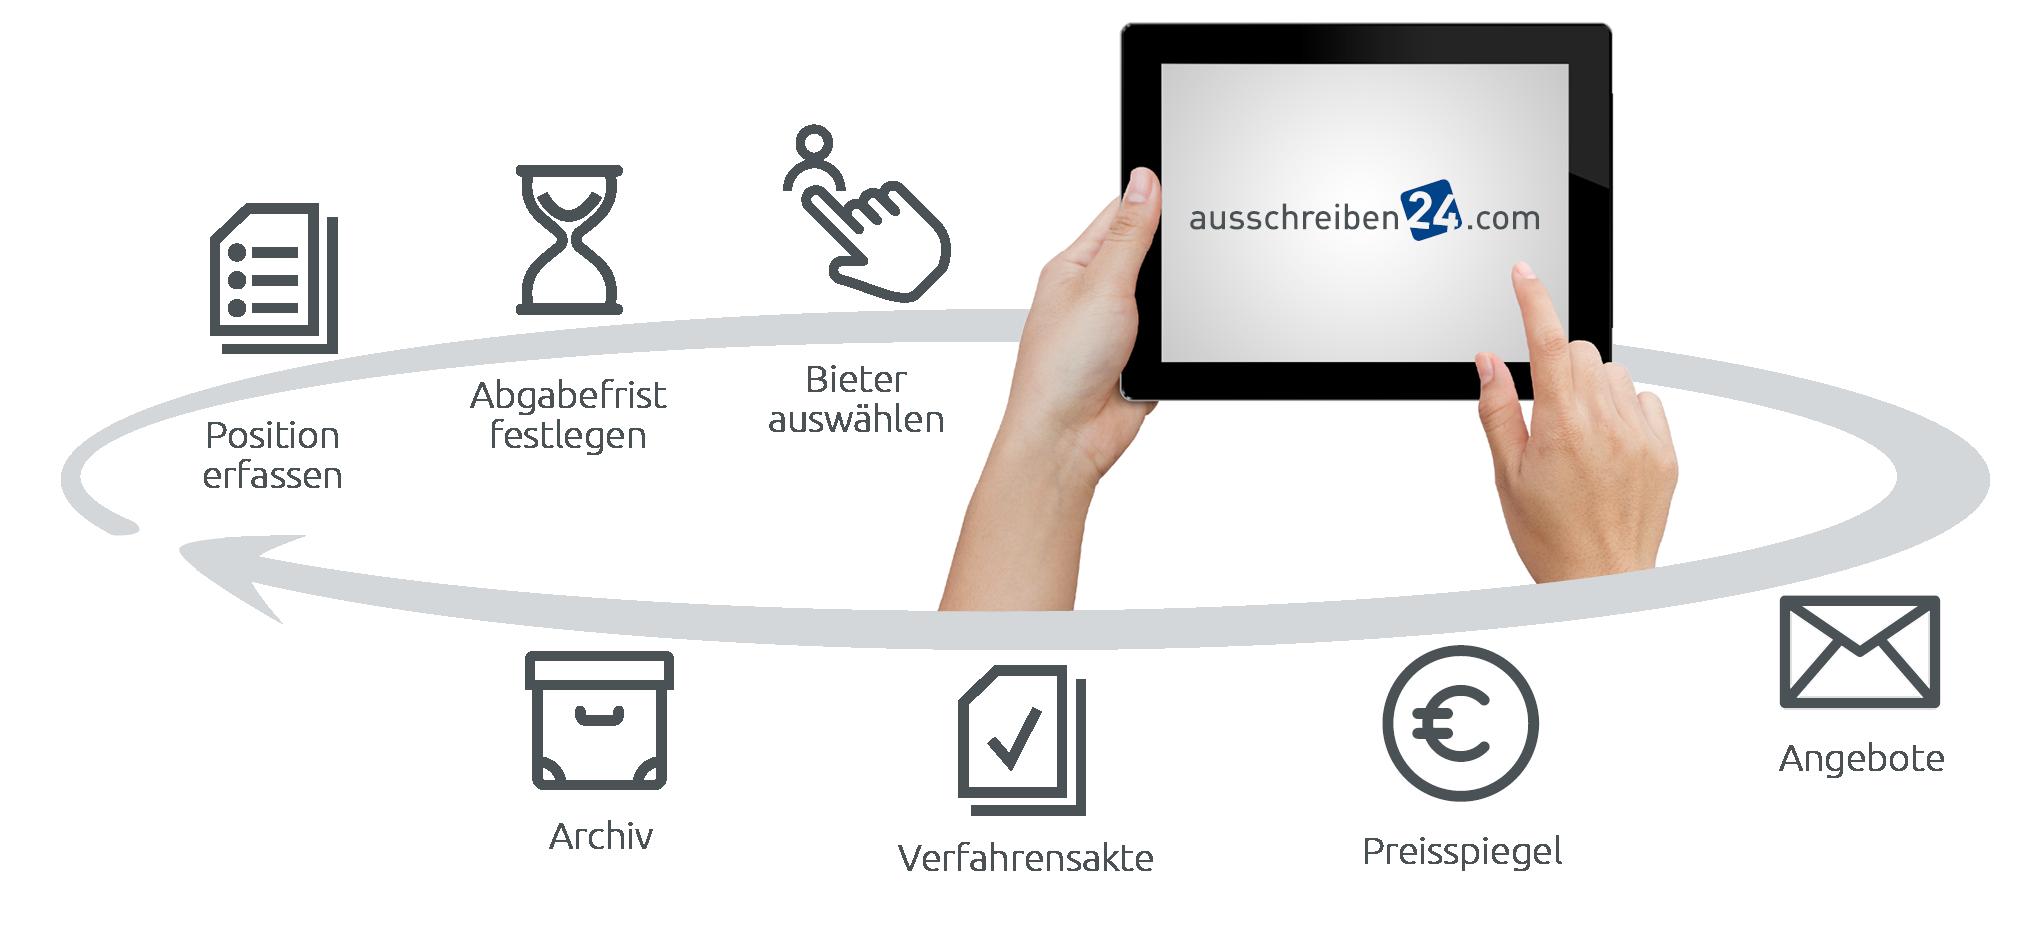 www.ausschreiben24.com